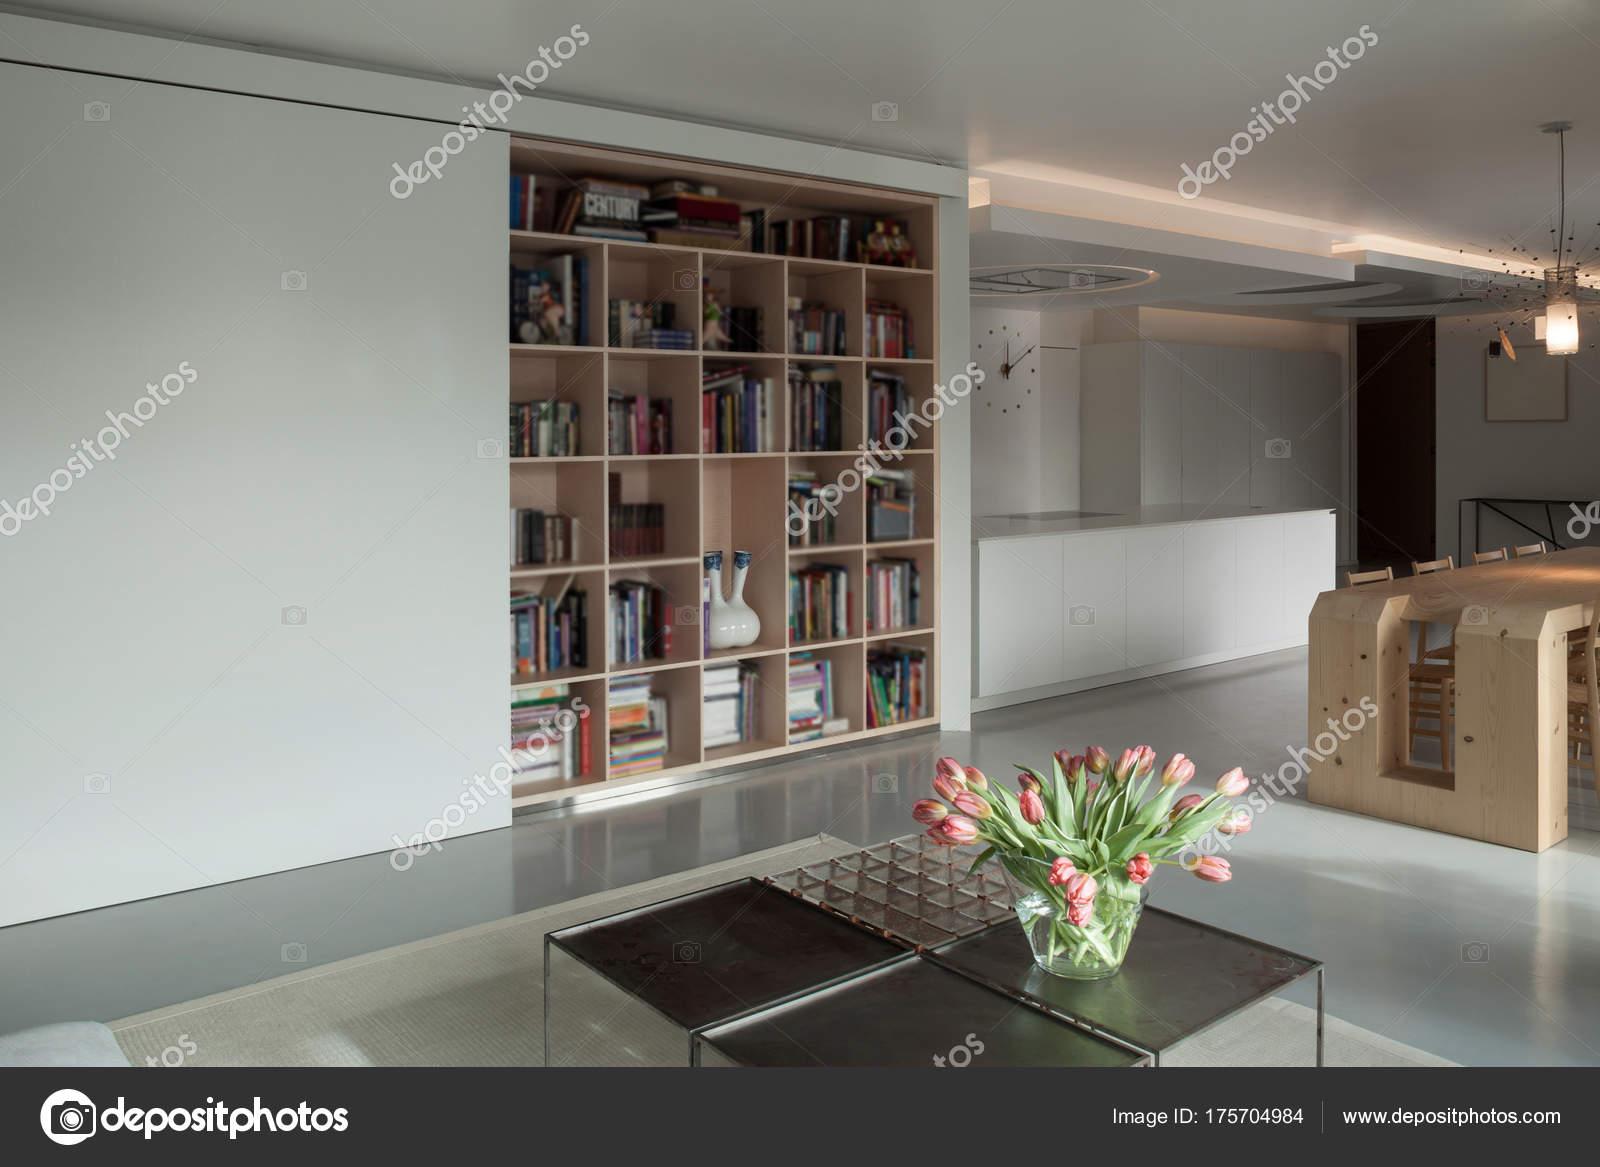 Interieur houten boekenkast u2014 stockfoto © zveiger #175704984